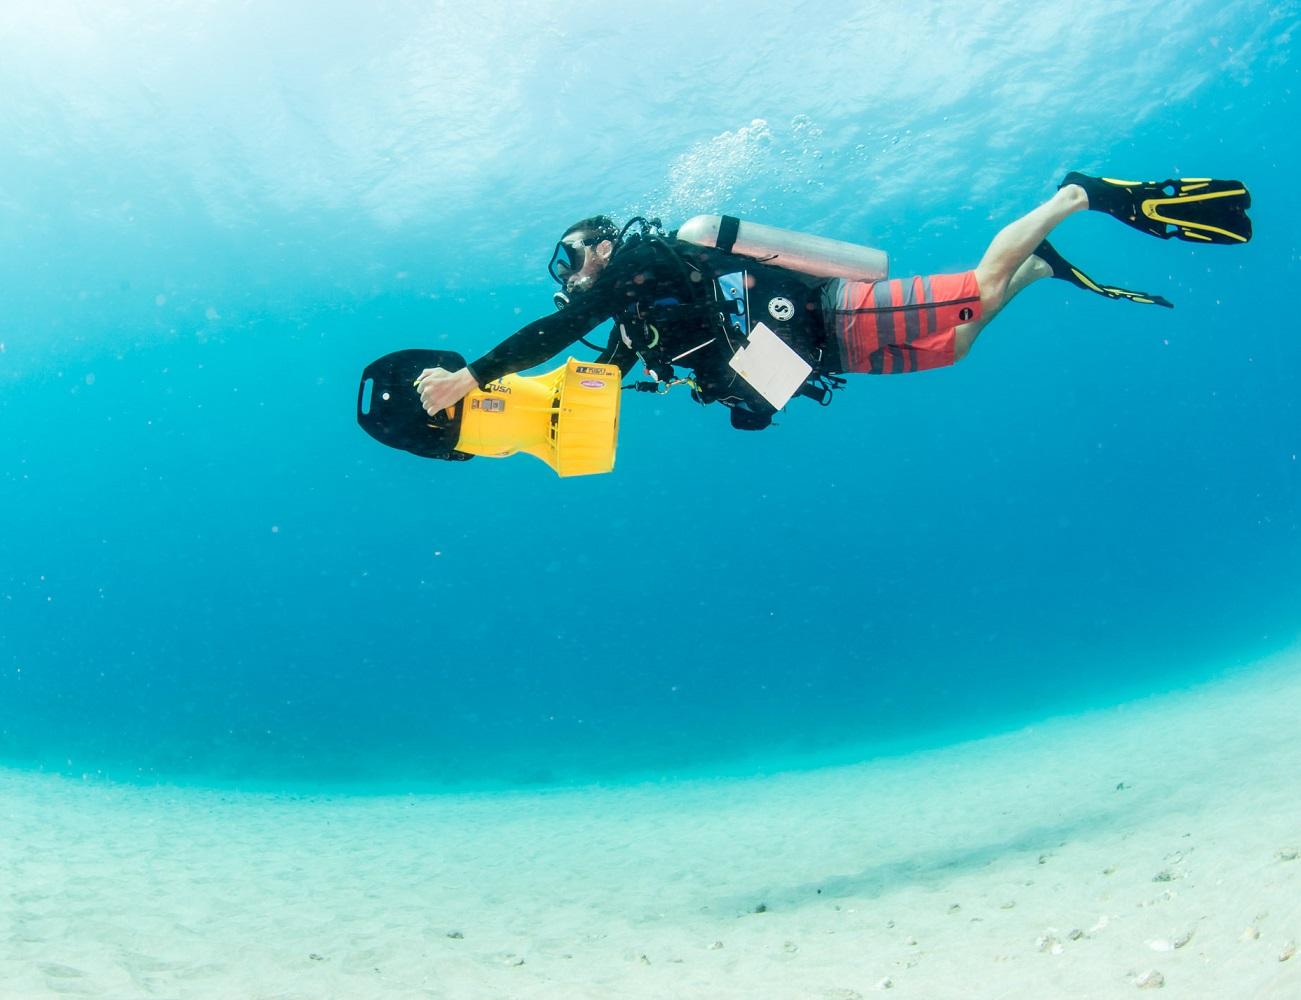 SAV-7 Underwater Scooter by Tusa